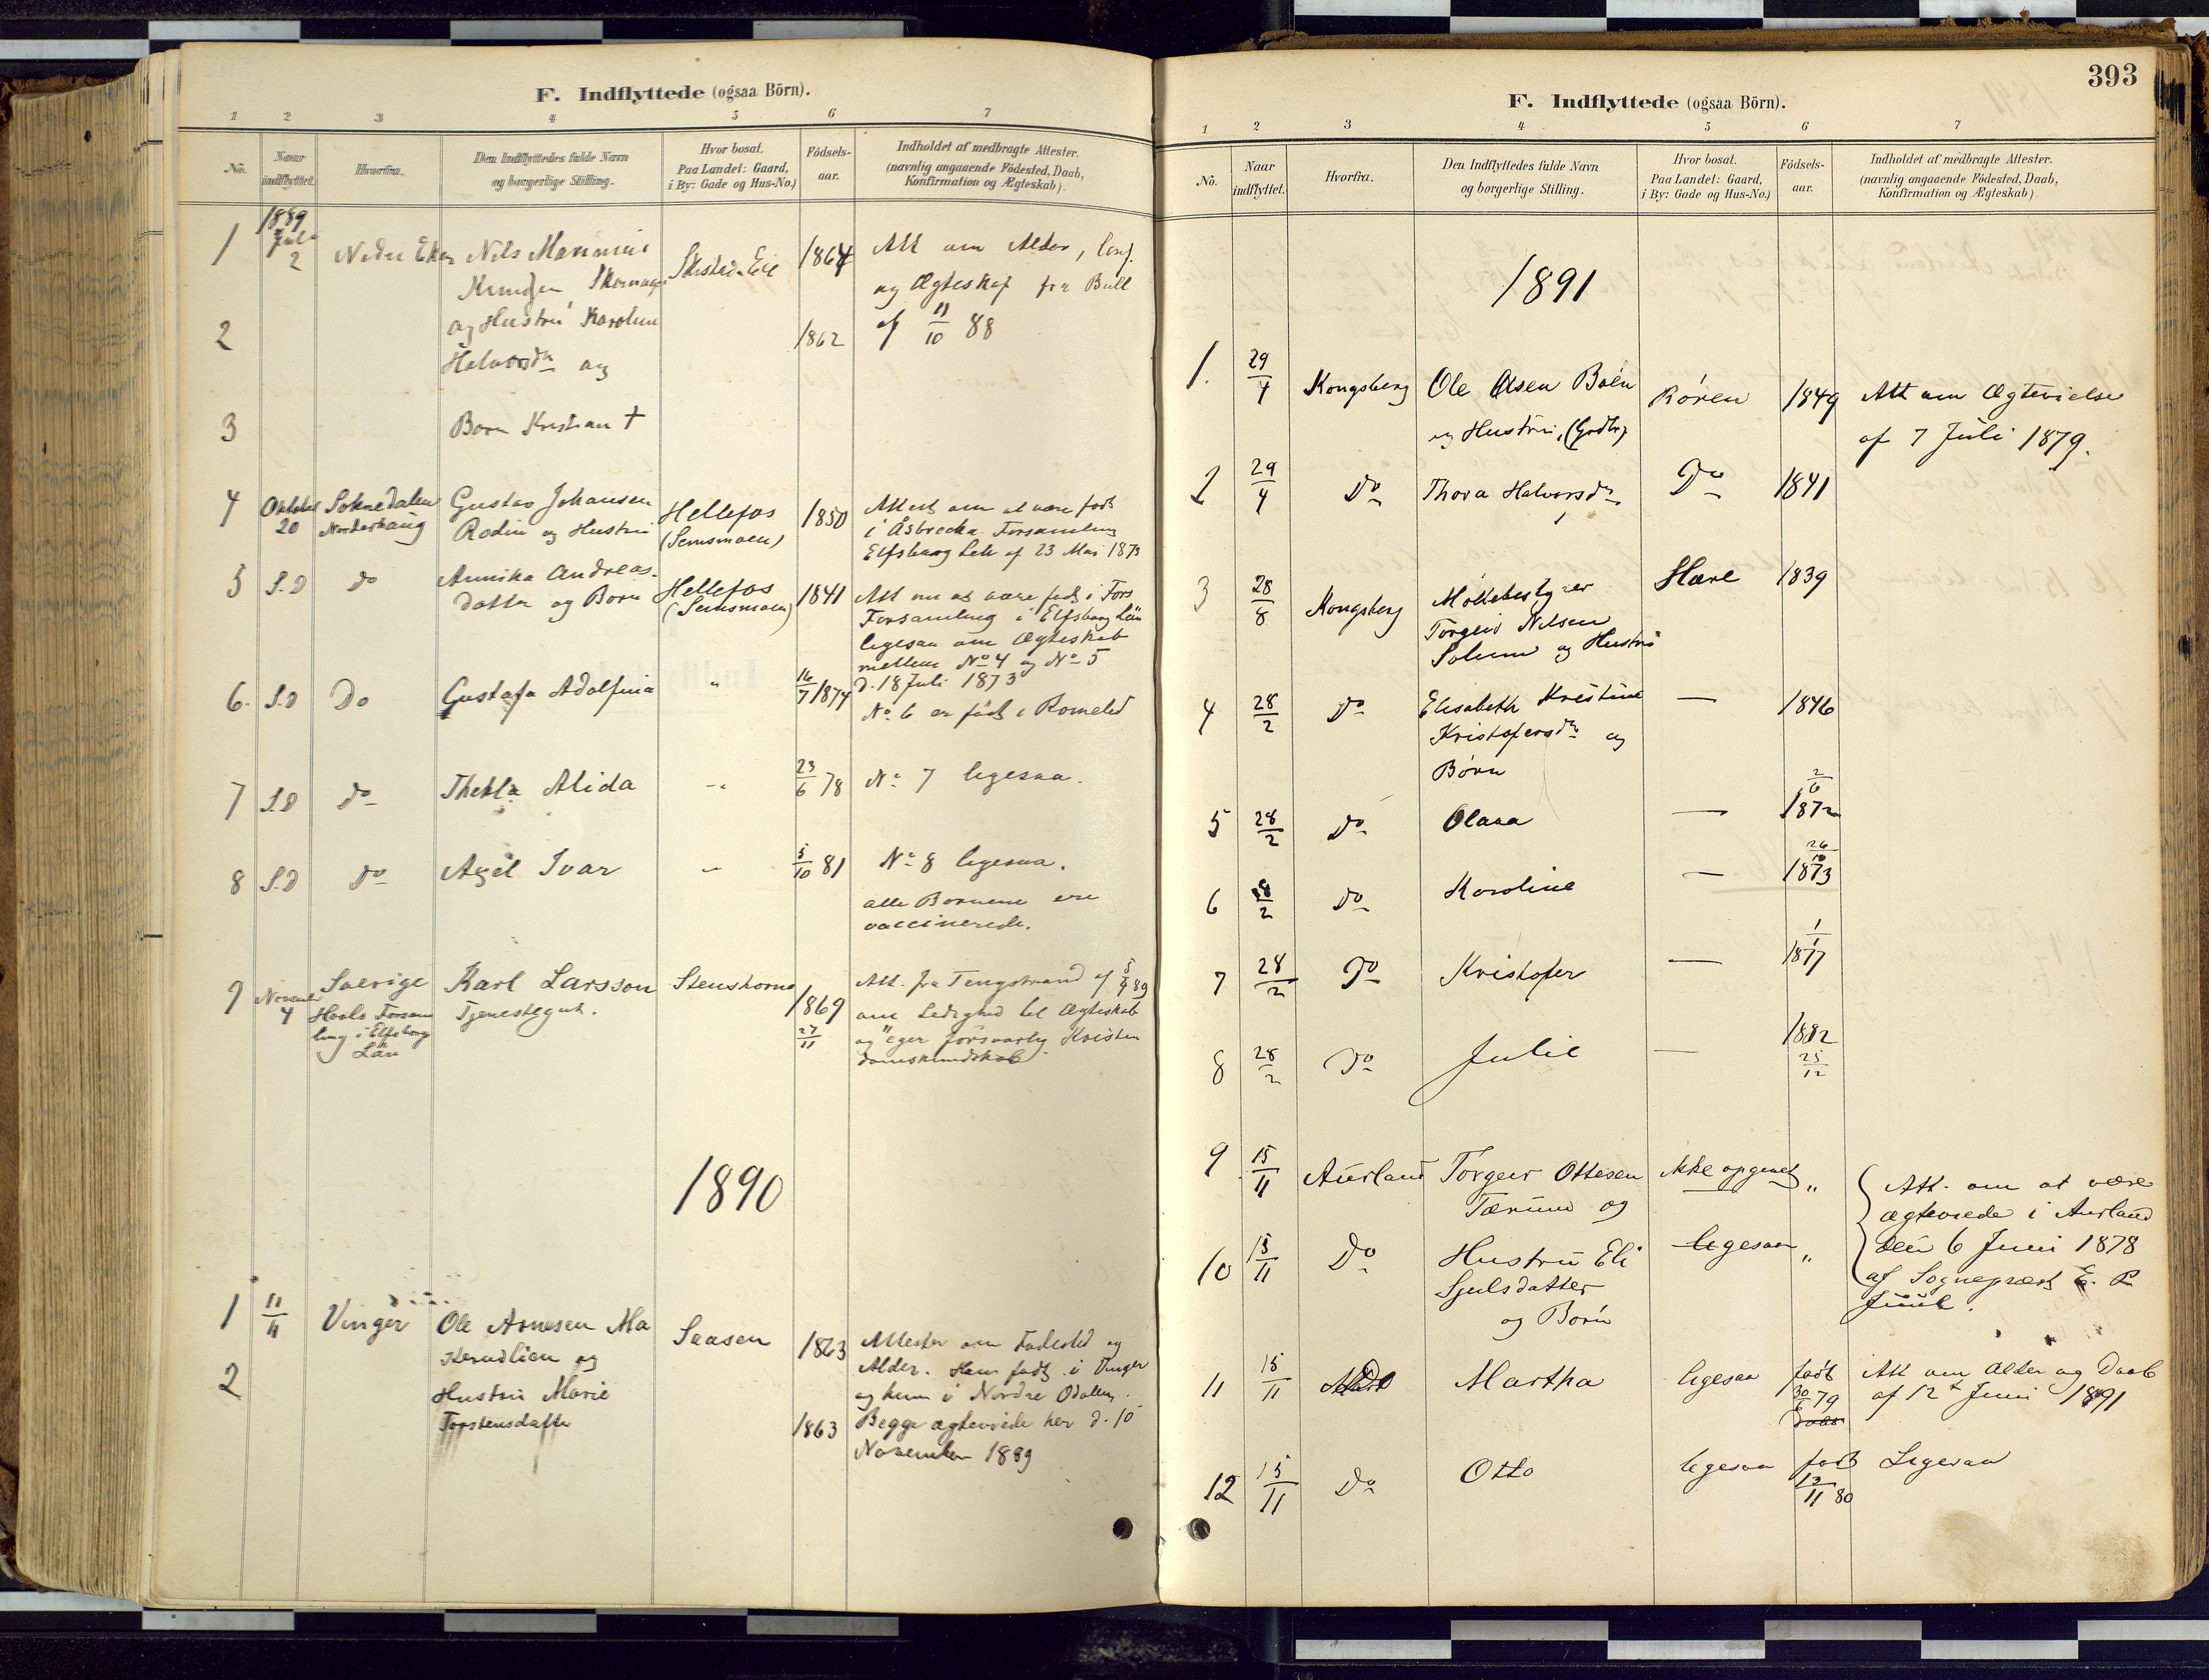 SAKO, Eiker kirkebøker, F/Fb/L0002: Ministerialbok nr. II 2, 1889-1896, s. 393